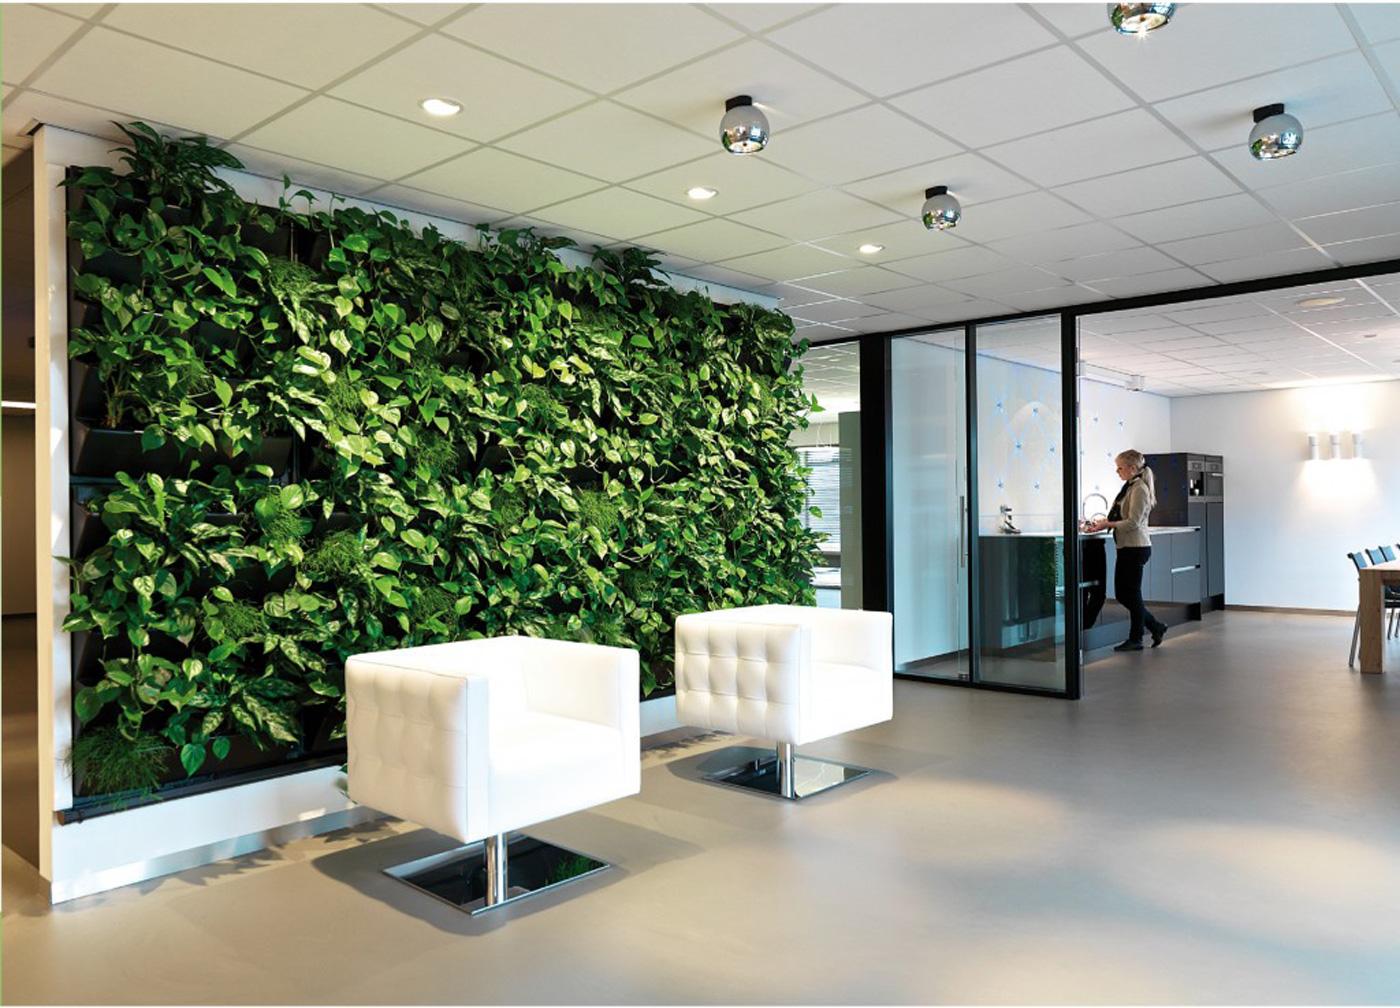 Green walls living walls office landscapes for Green office interior design